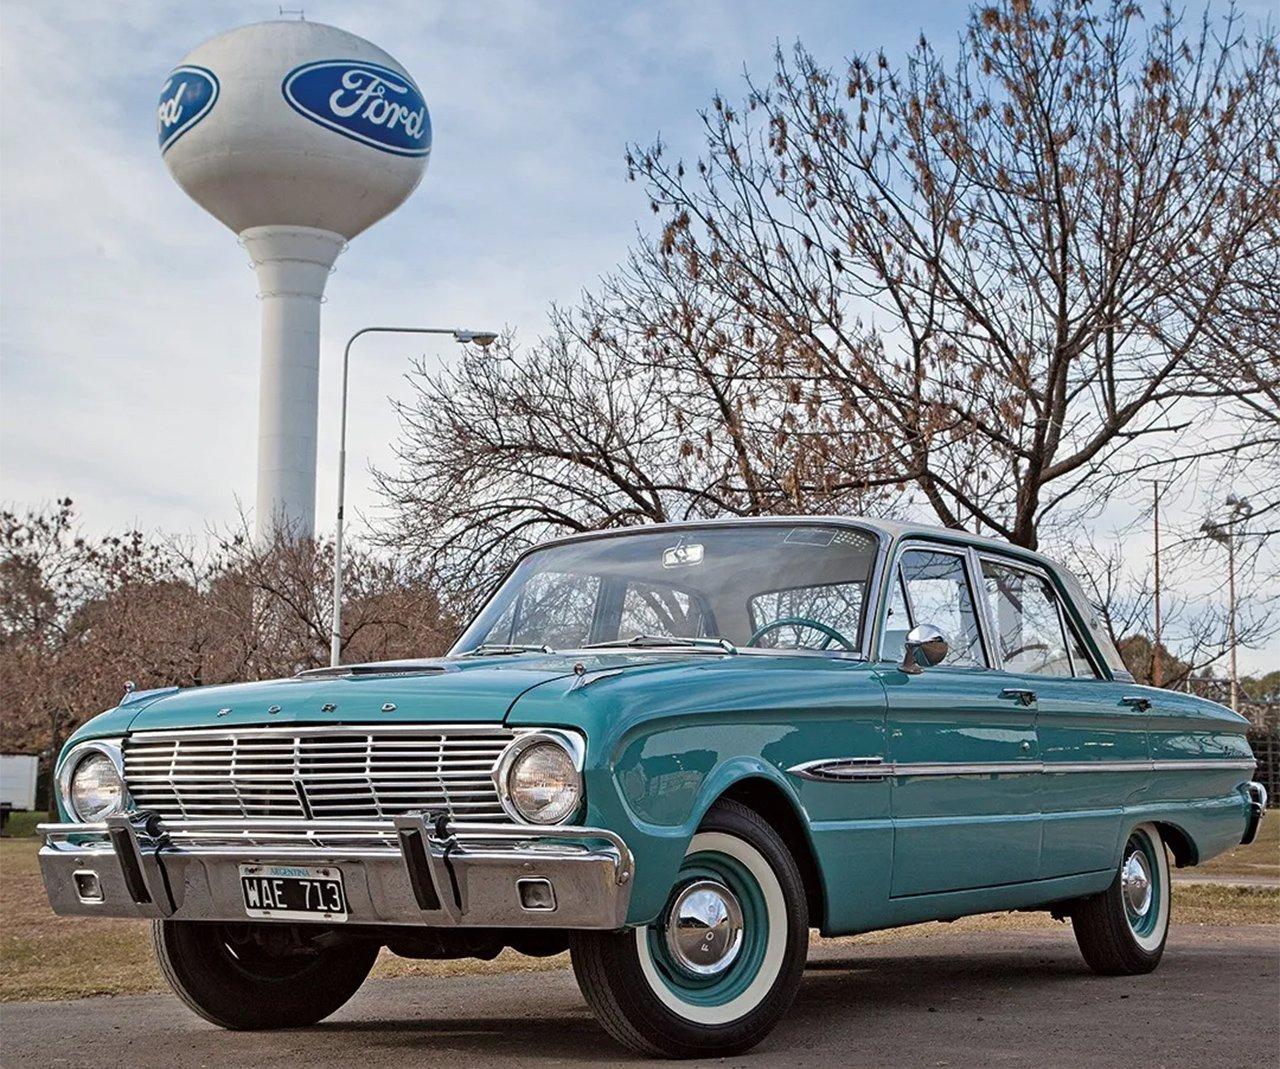 ford falcon 1963 azul e branco de frente na argentina